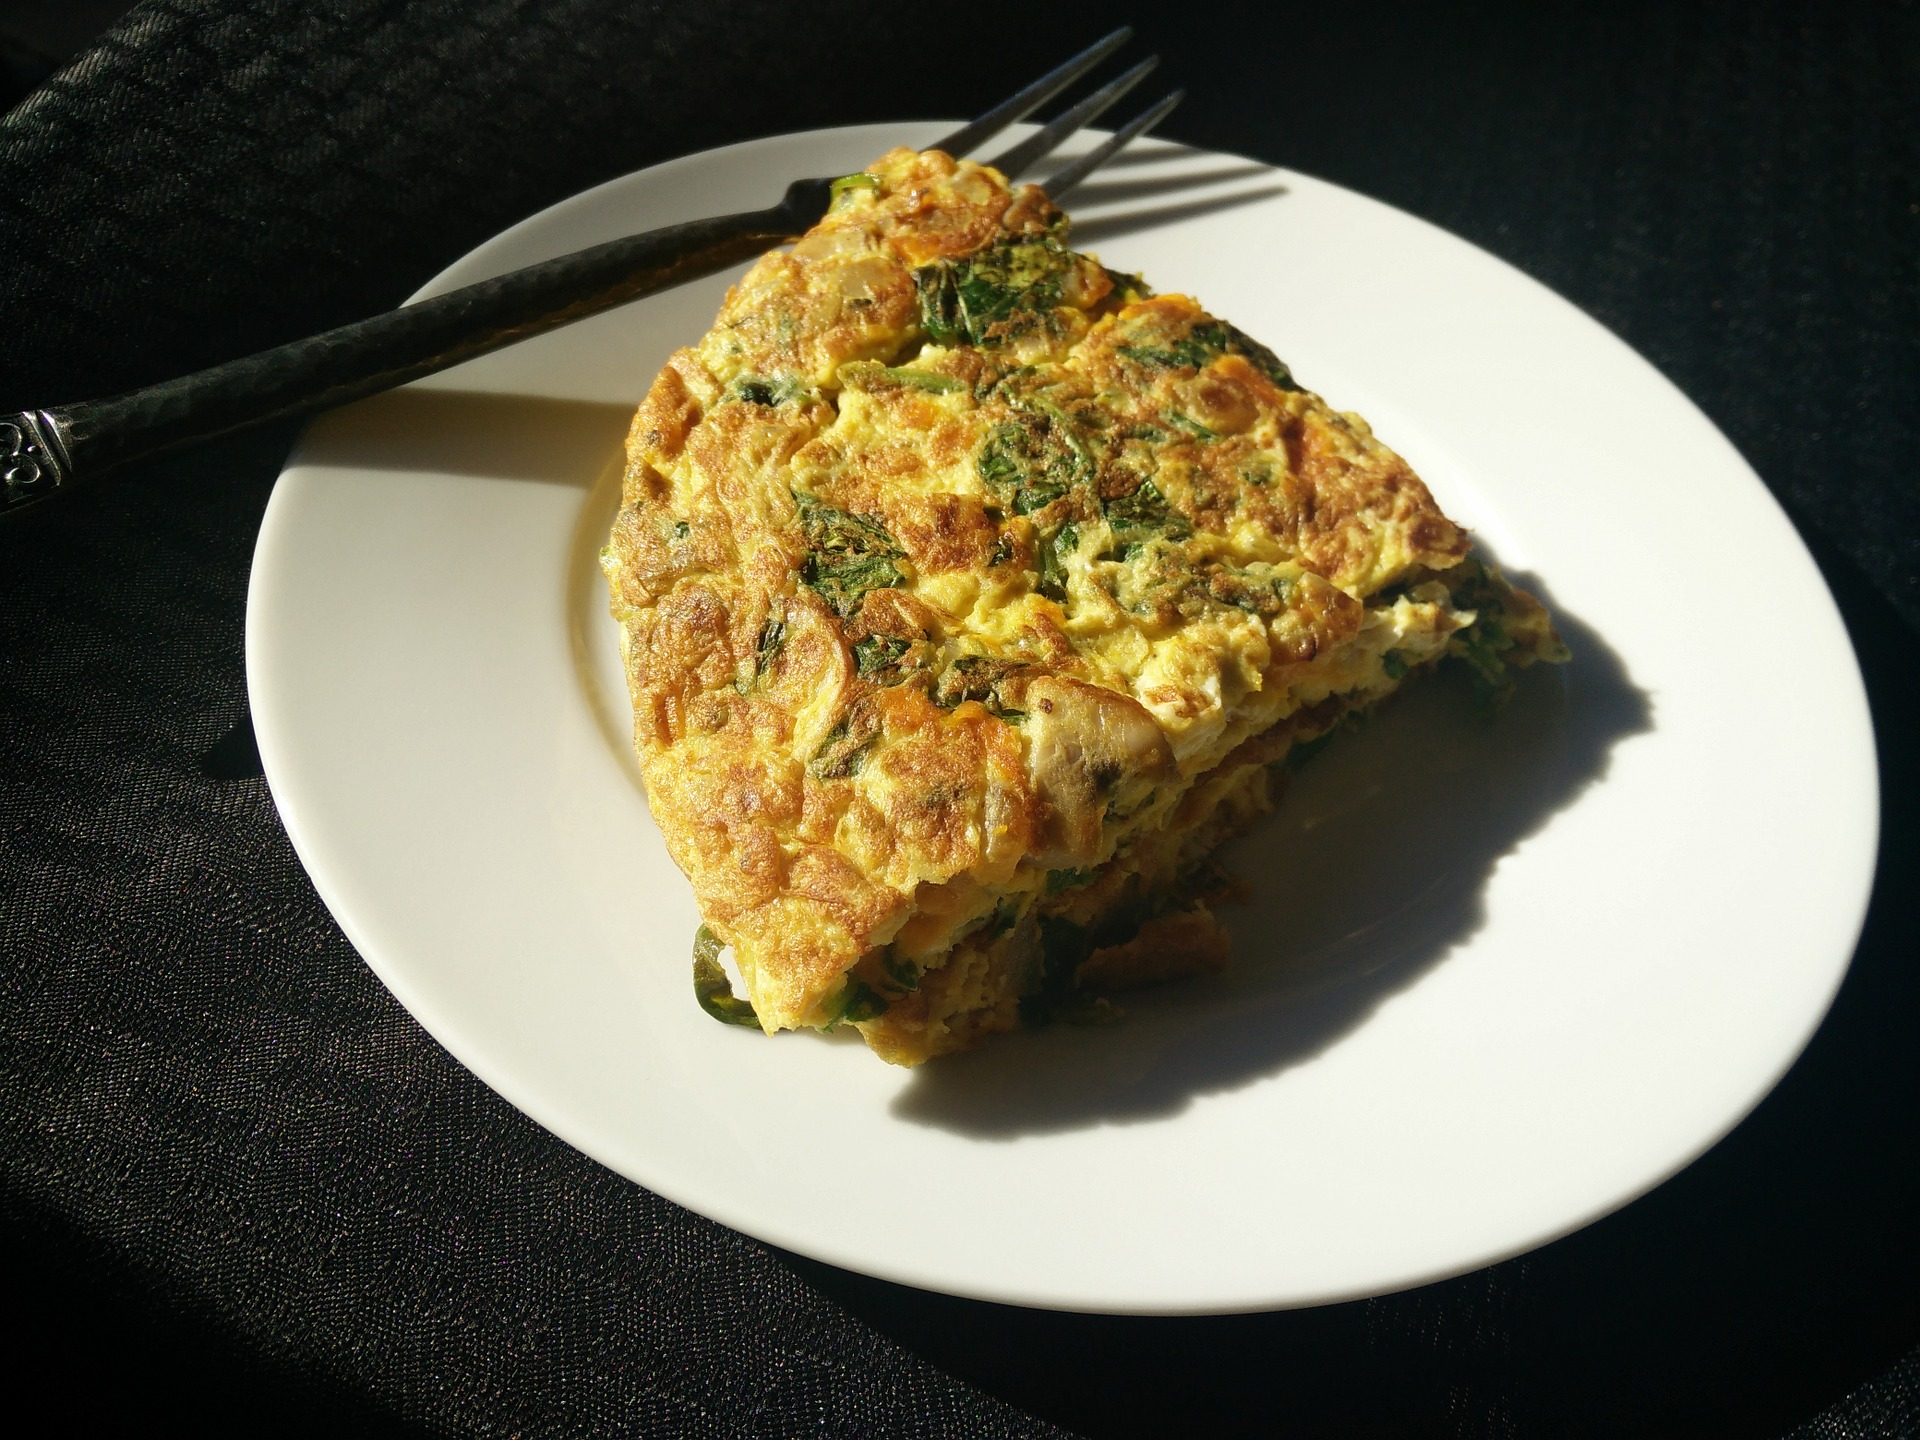 Omleta cu sunca afumata - sfatulparintilor.ro - pixabay_com - omelette-1071021_1920